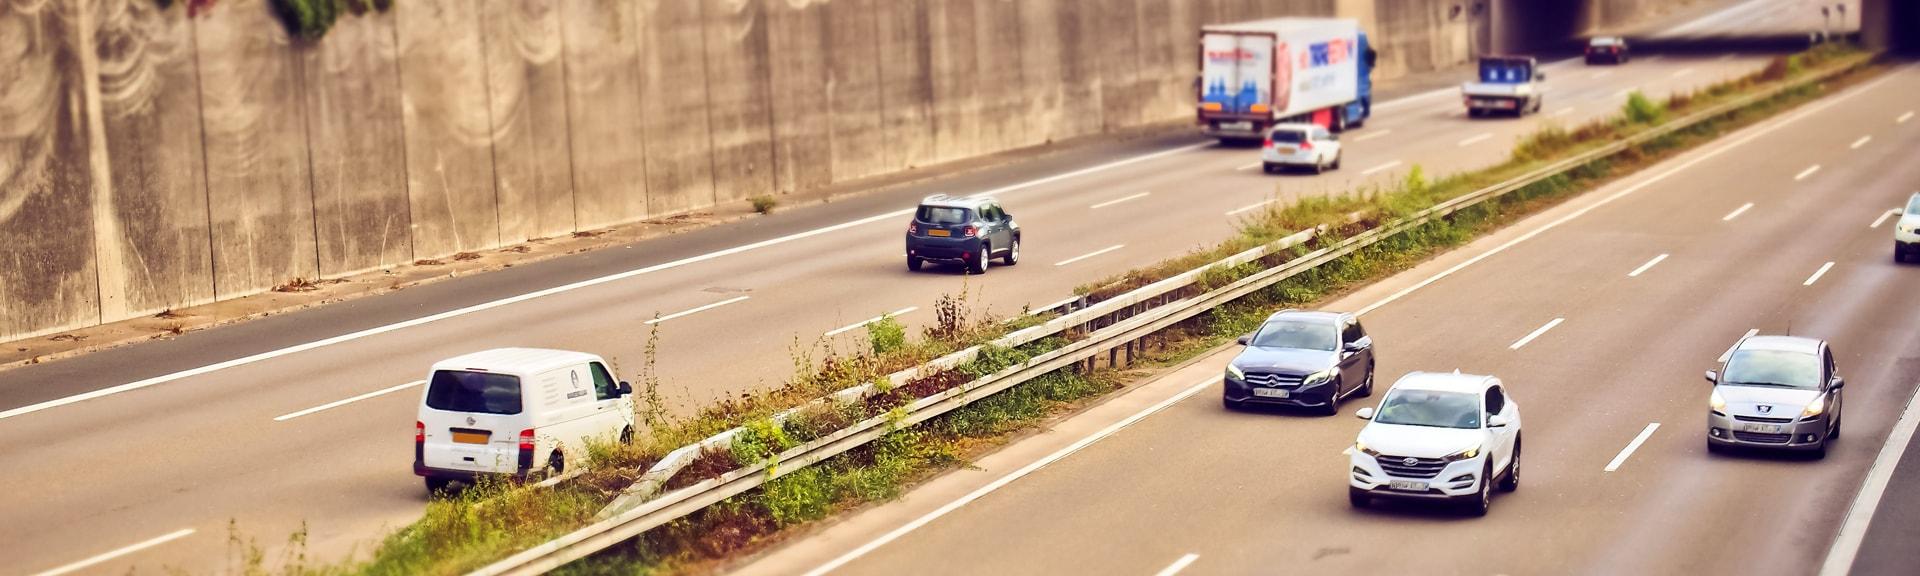 Vehicle compliance min